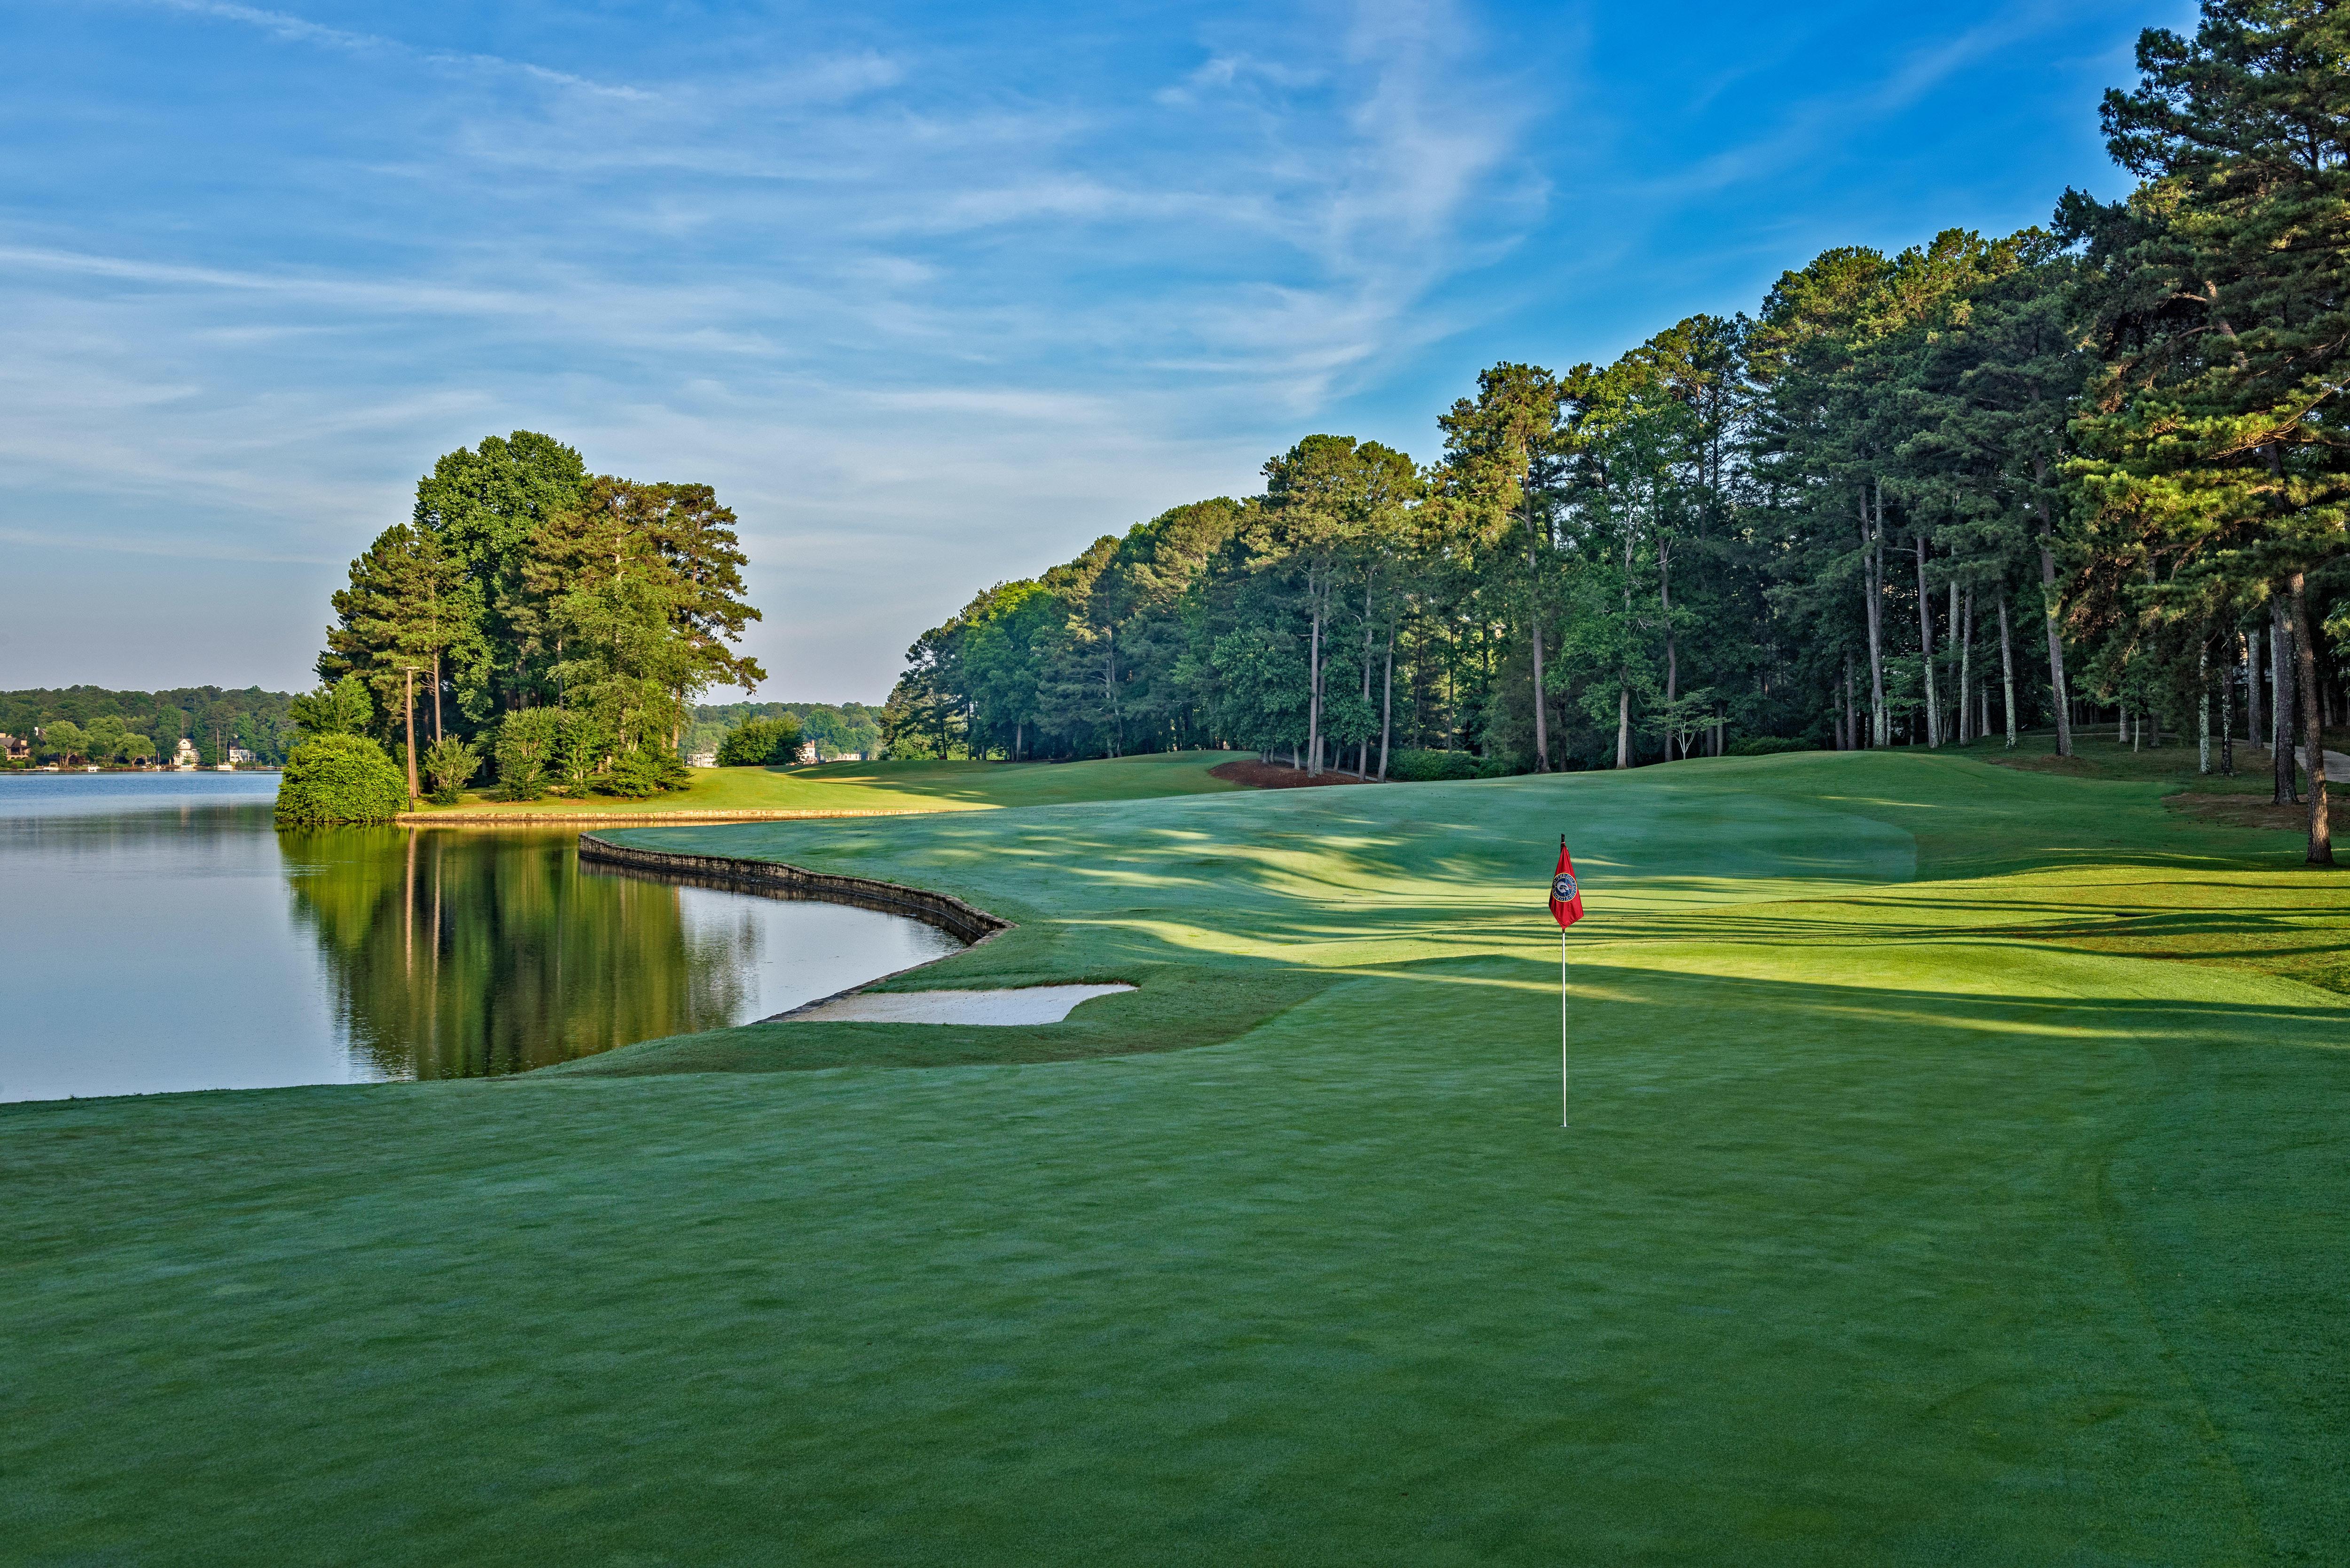 The Golf Club of Georgia image 1